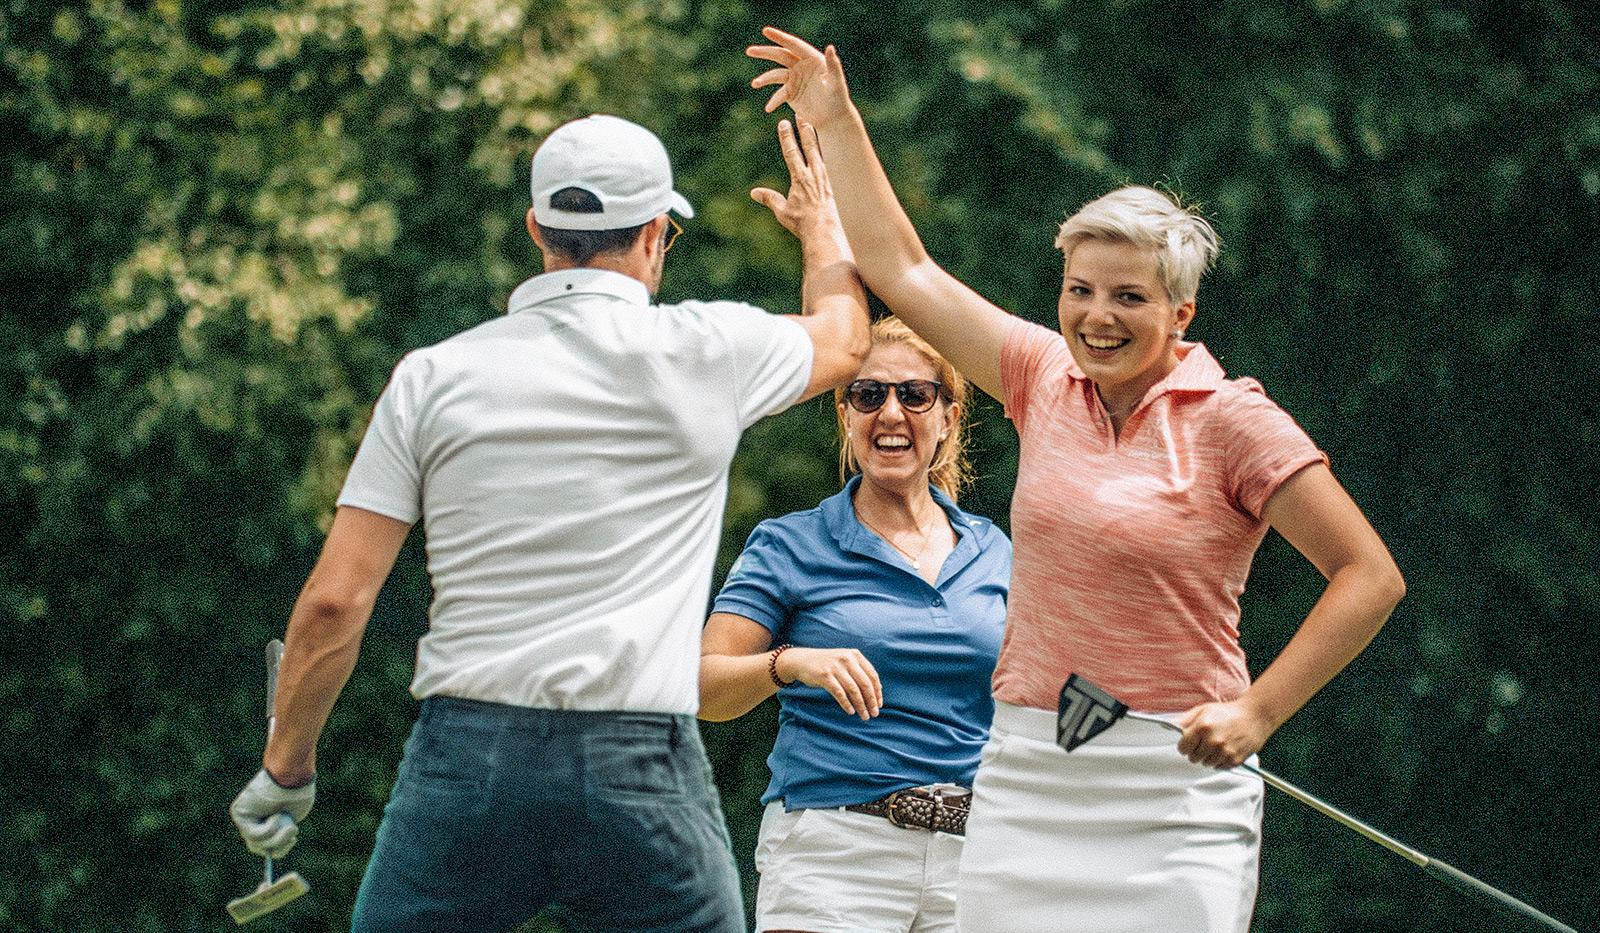 celebrity golf camp2 - Celebrity Golf Camp